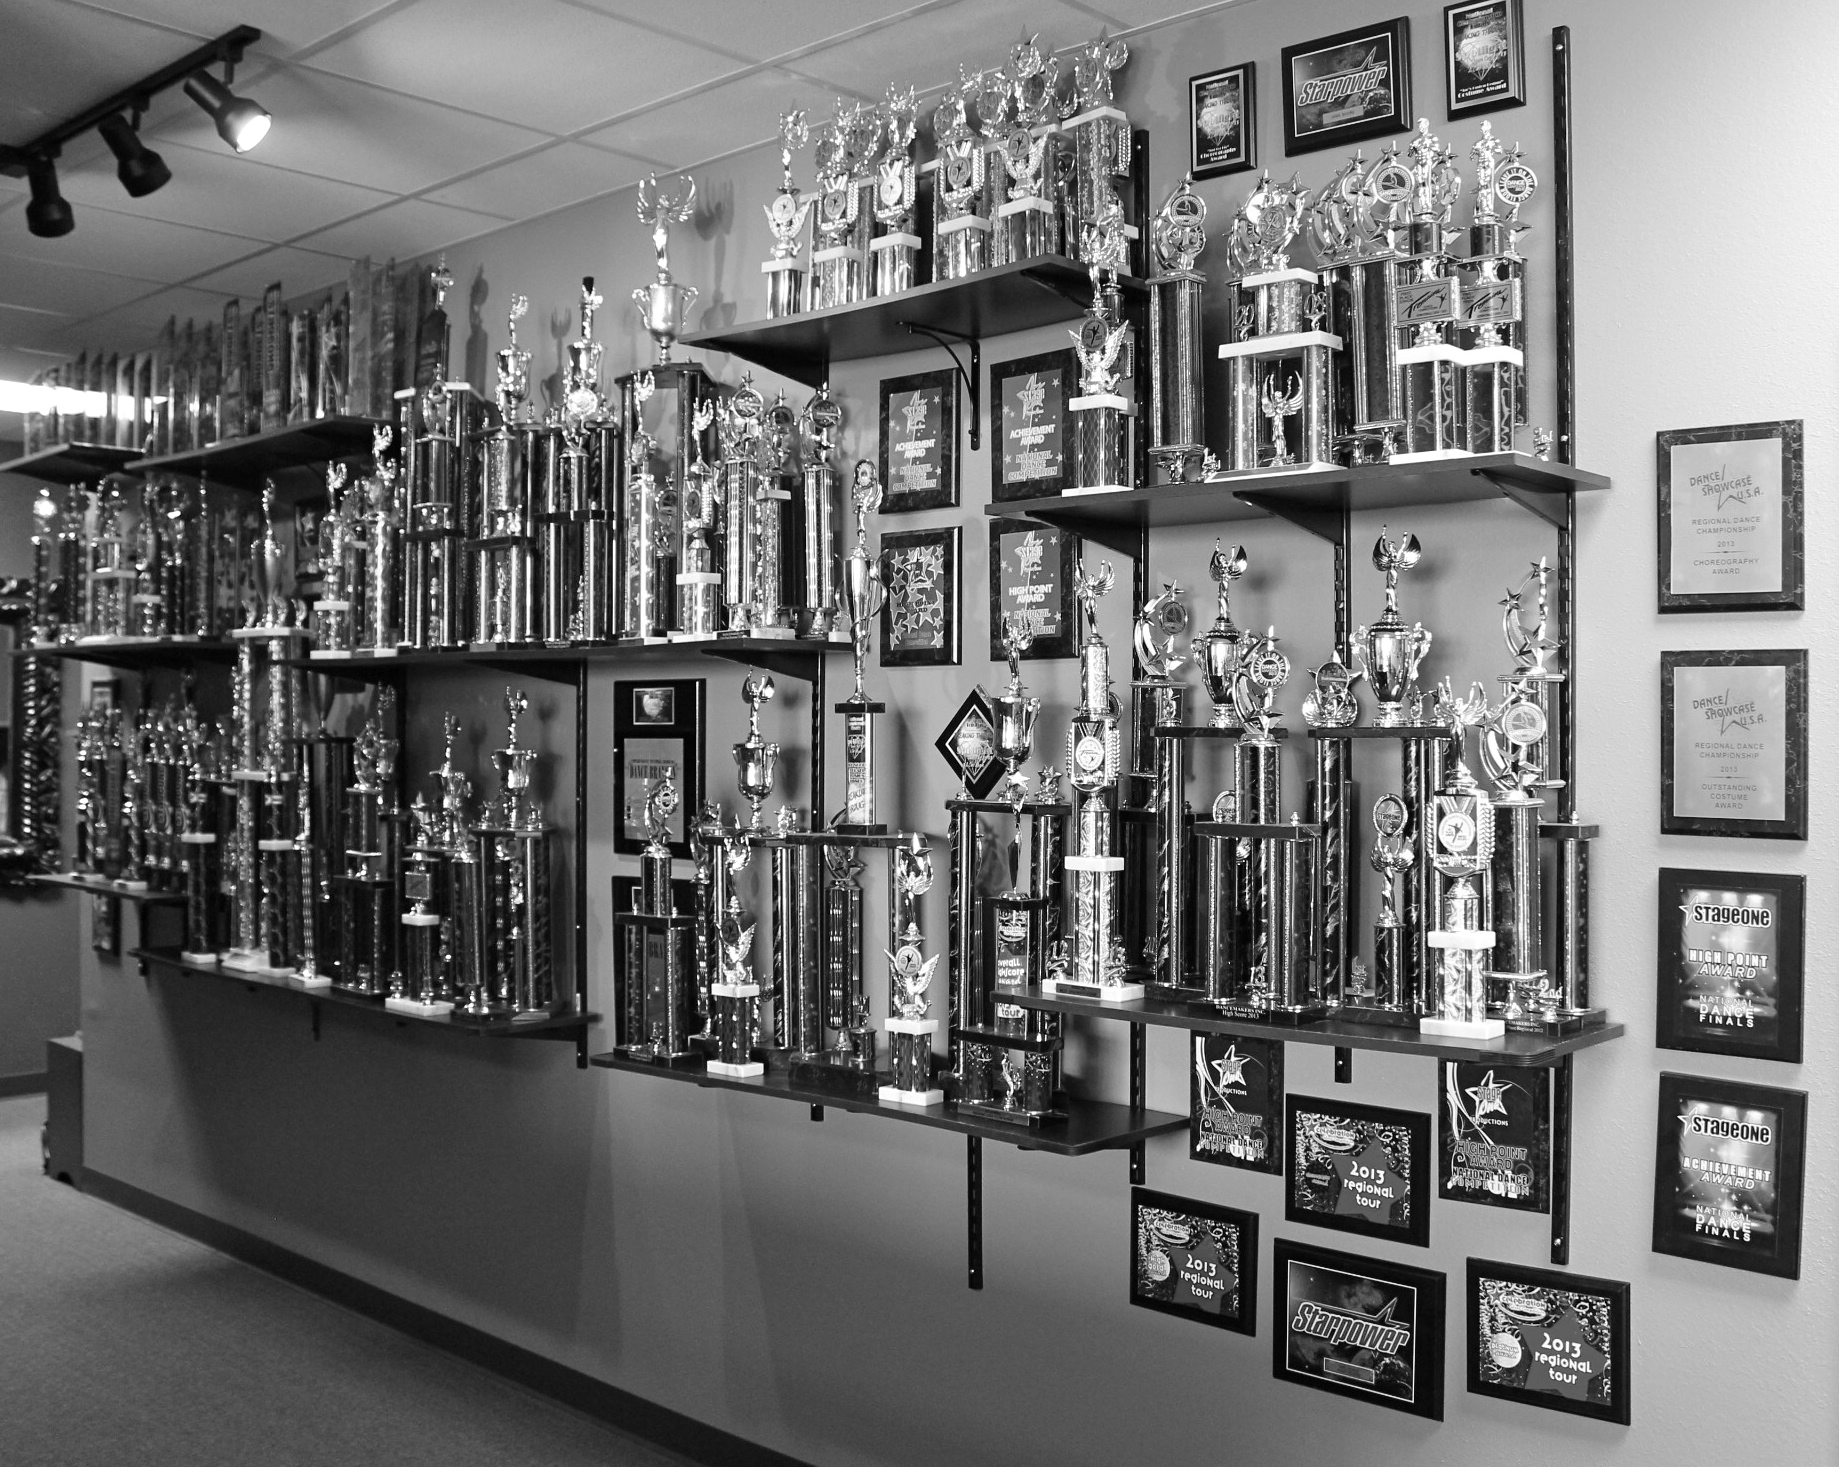 Dance Team Trophy Wall